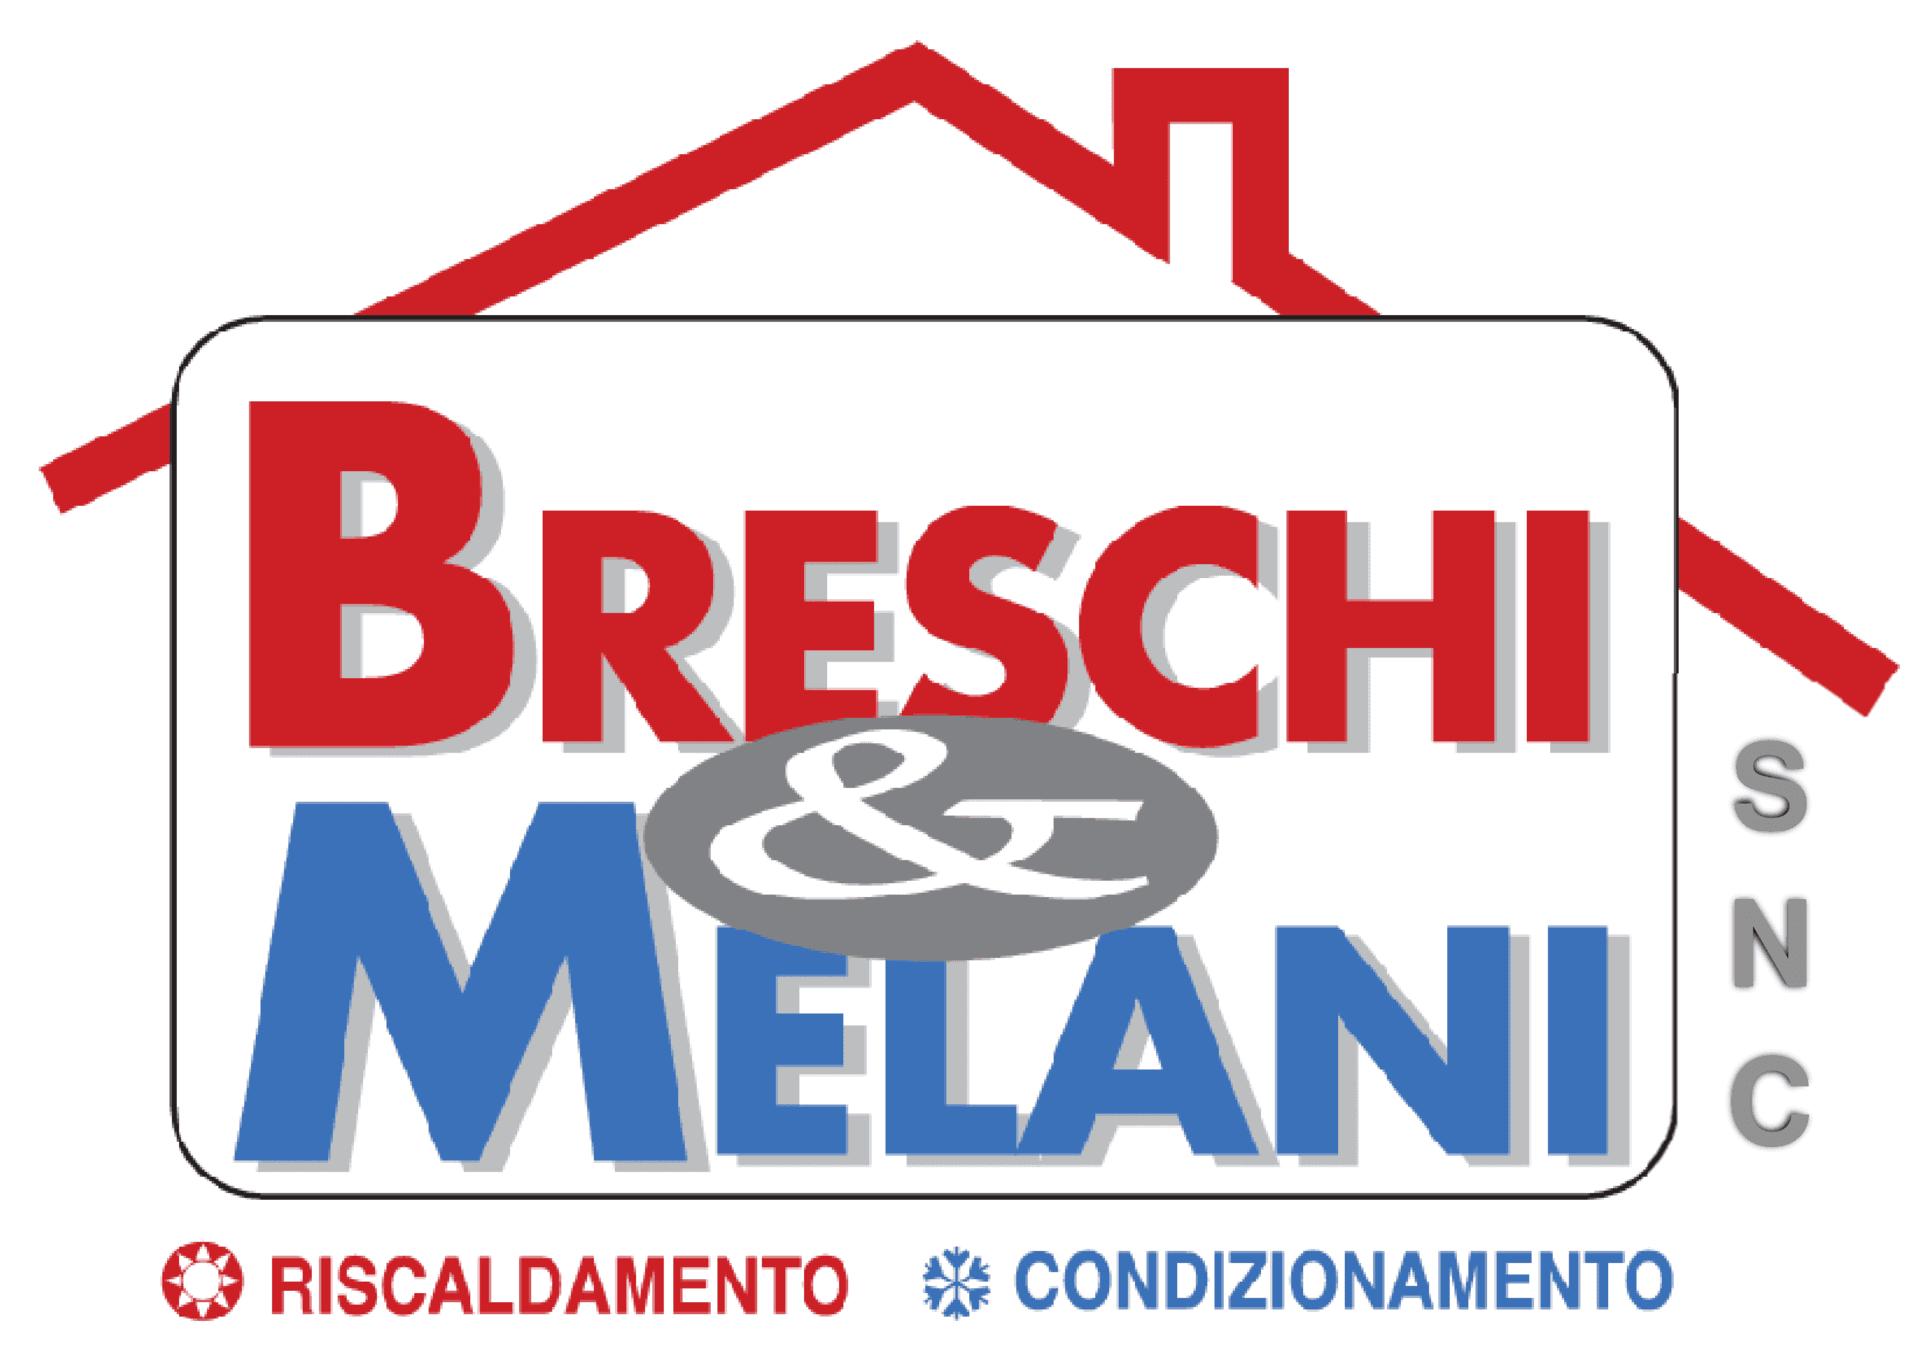 BRESCHI & MELANI - Logo